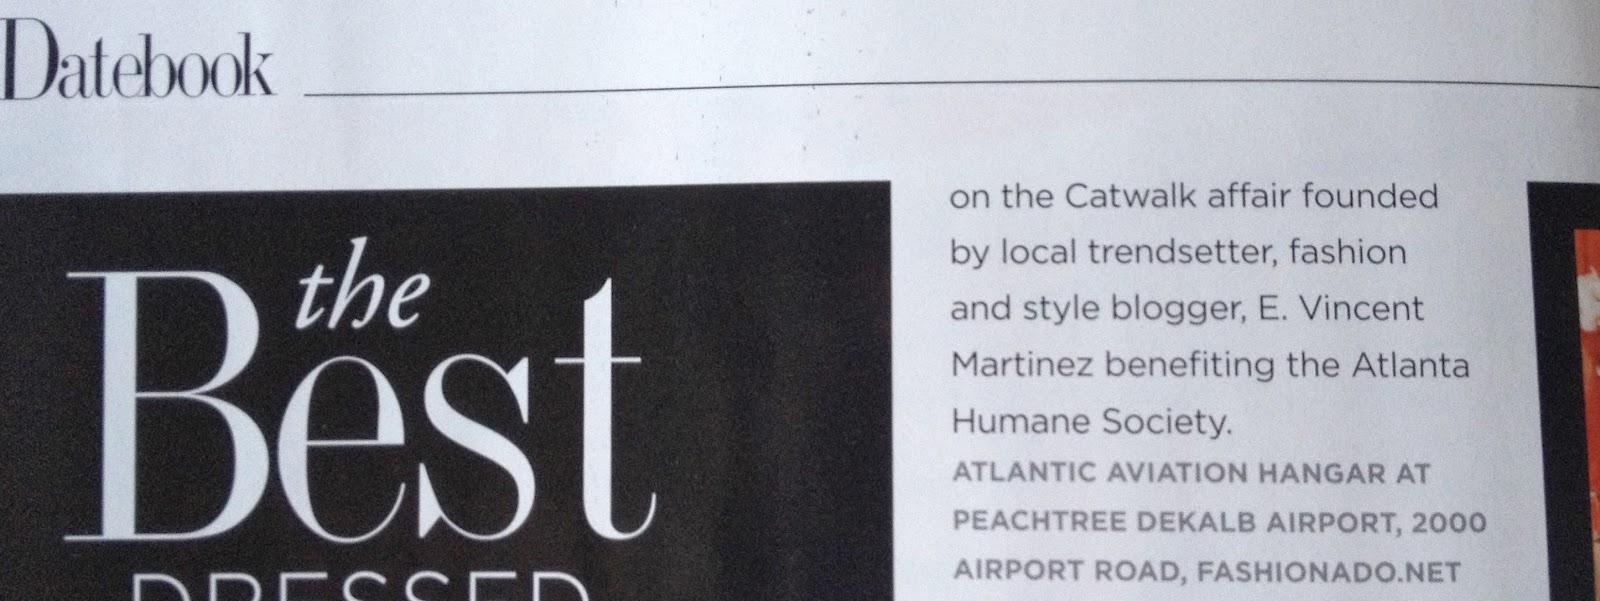 e-vincent-martinez-modern-luxury-atlantan-charity-social-datebook-fashionado